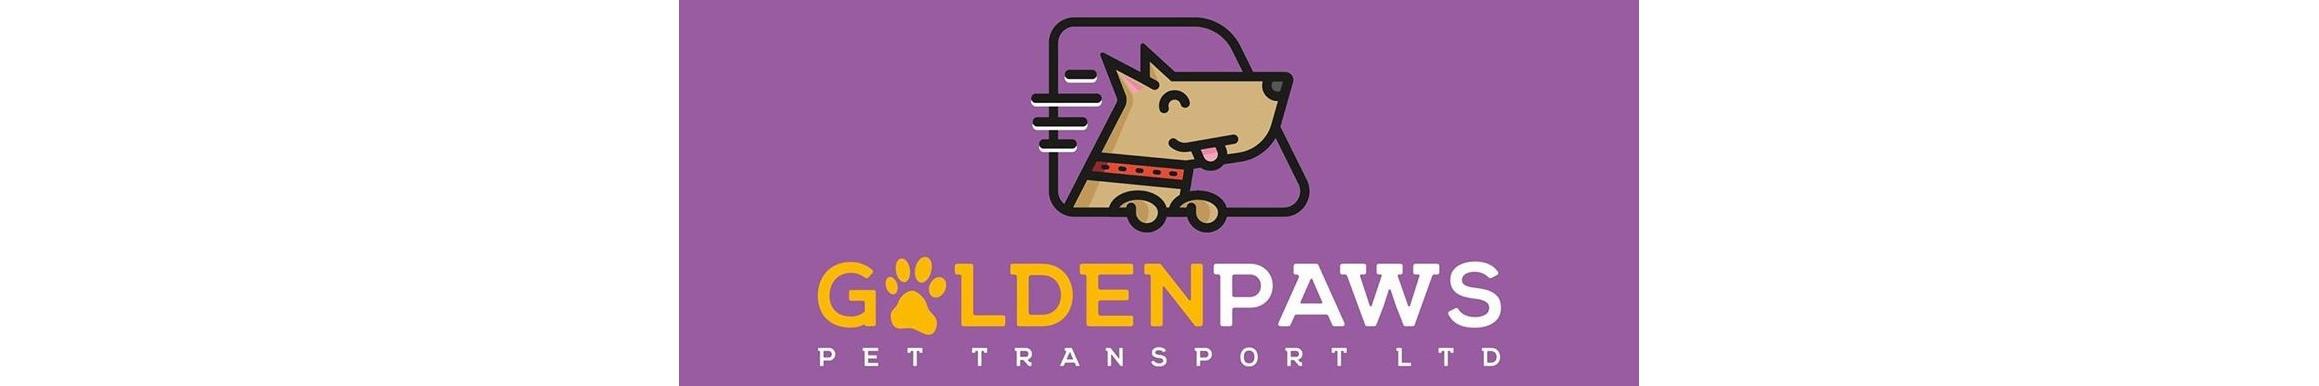 Golden Paws Pet Transport Ltd